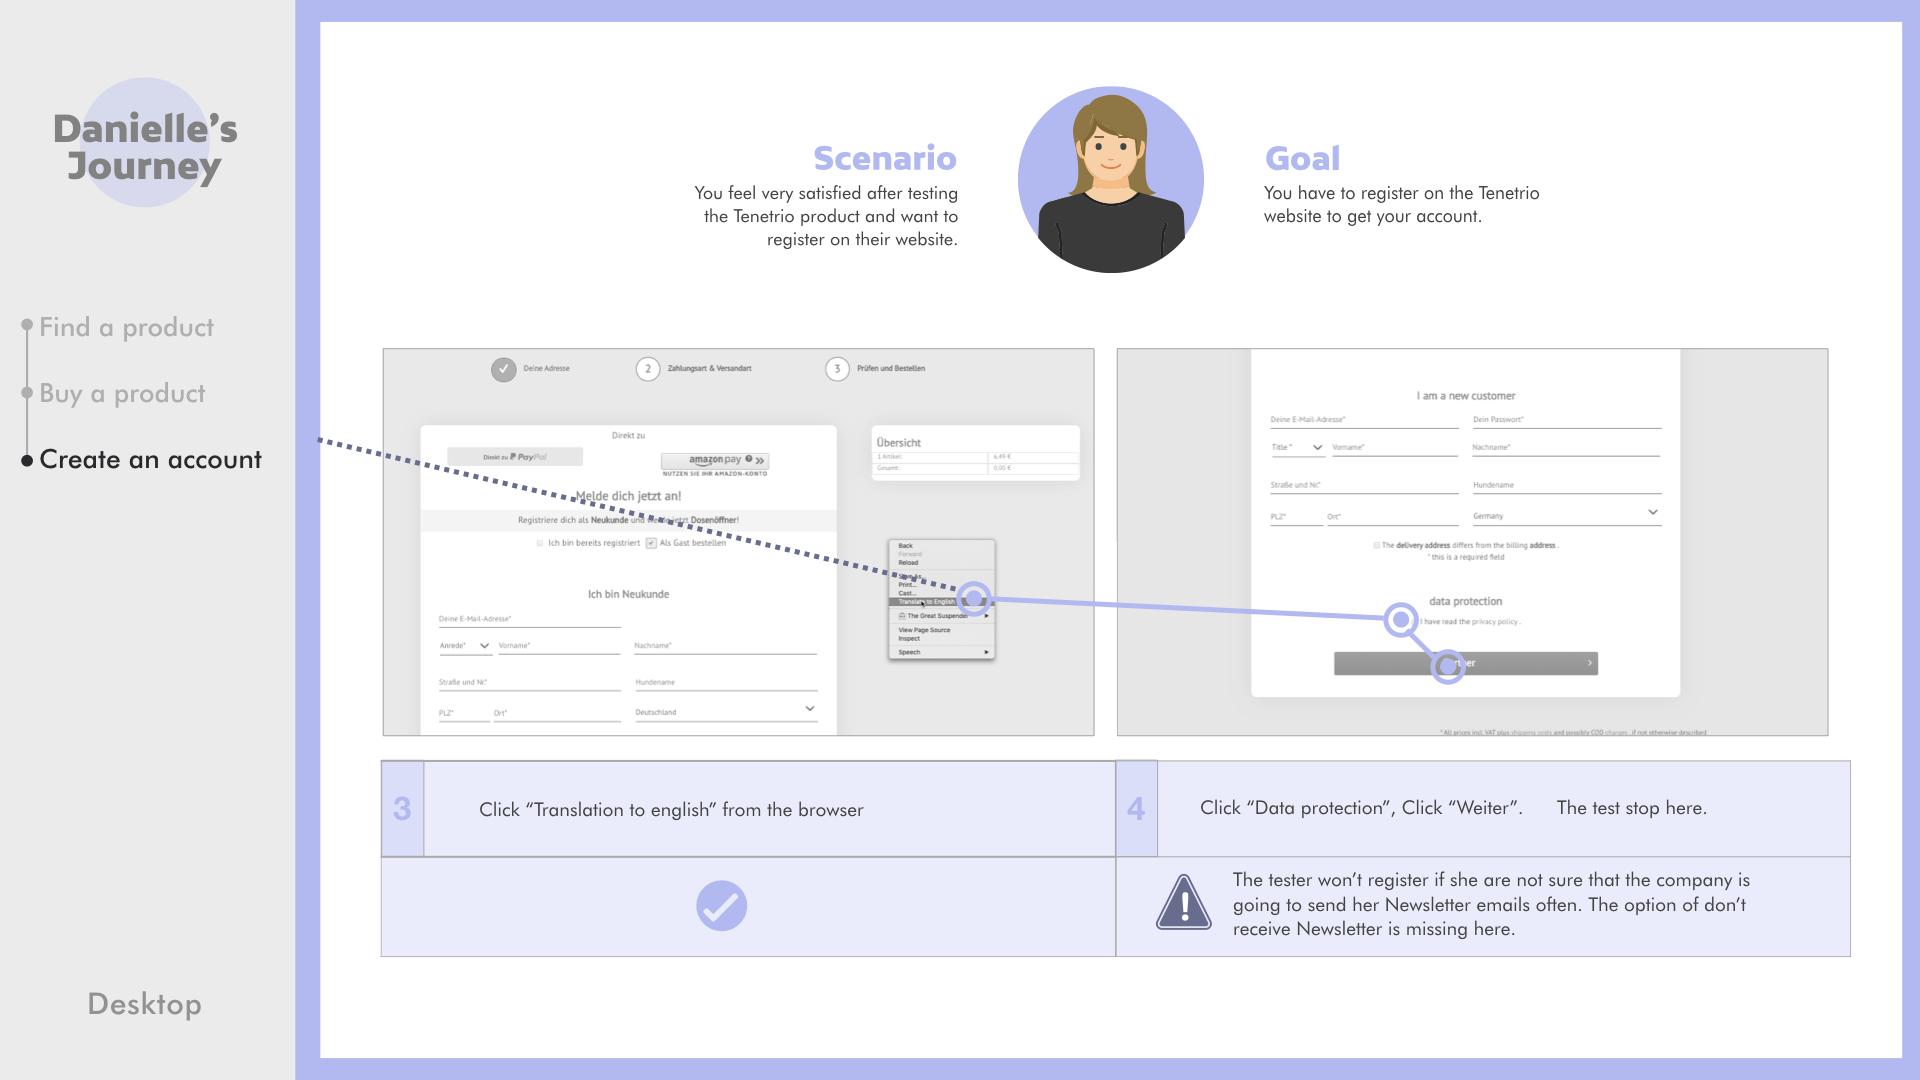 191112_Tenetrio_UX-Design191107_Tenetrio_UX-Design_Interview-Usability-Test.001